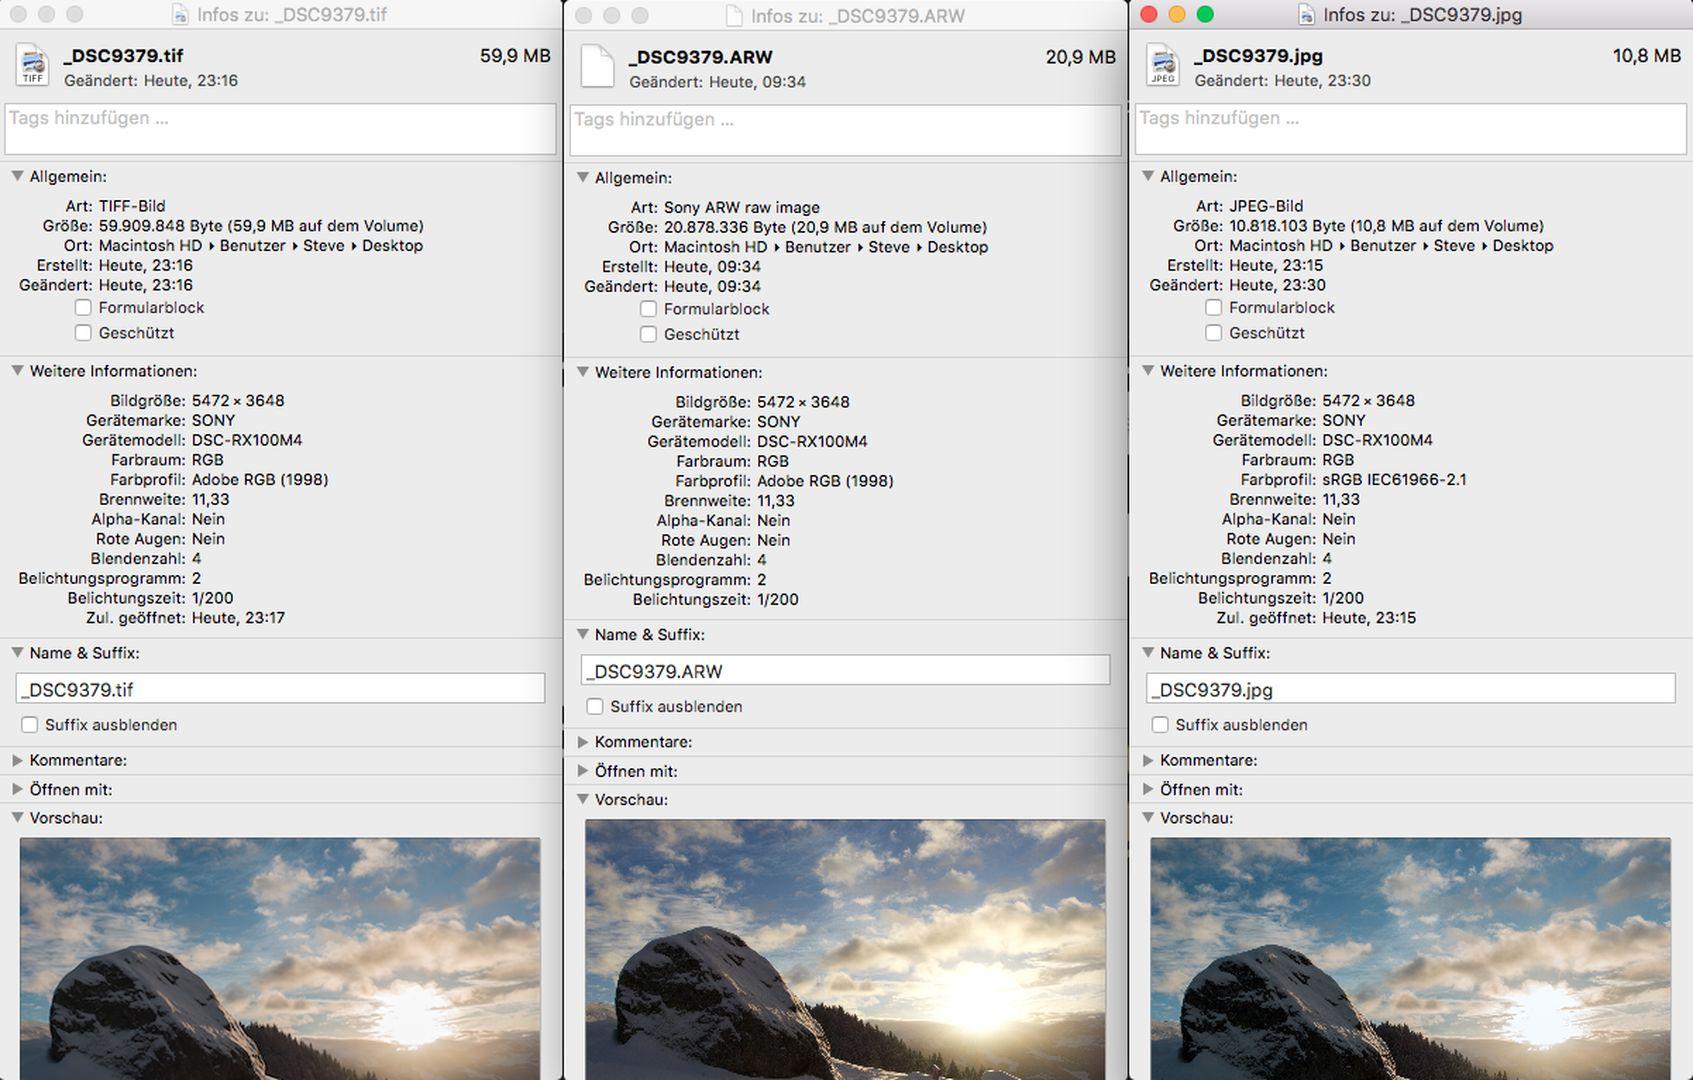 TIFF RAW JPG Vergleich - Sony RX100mIV - SmartCamNews